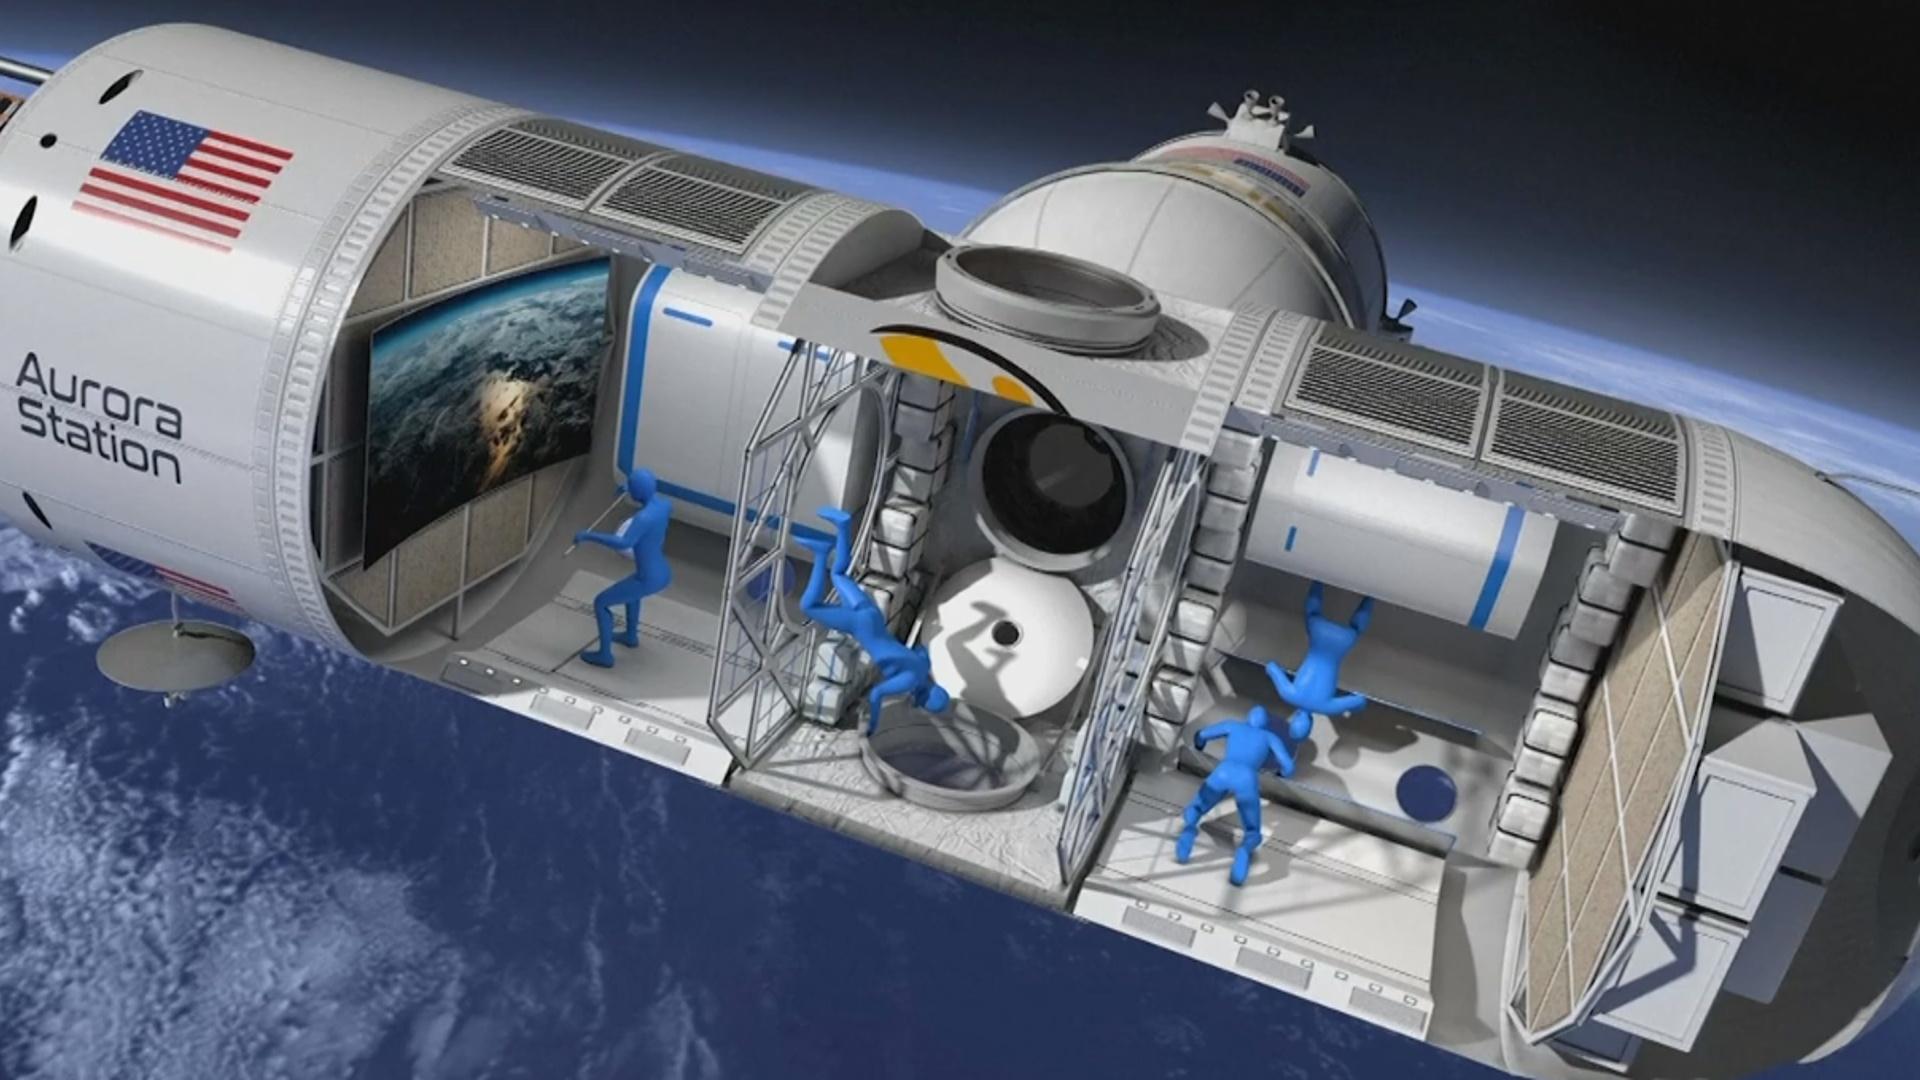 ABŞ kosmosda ilk otel açacaq